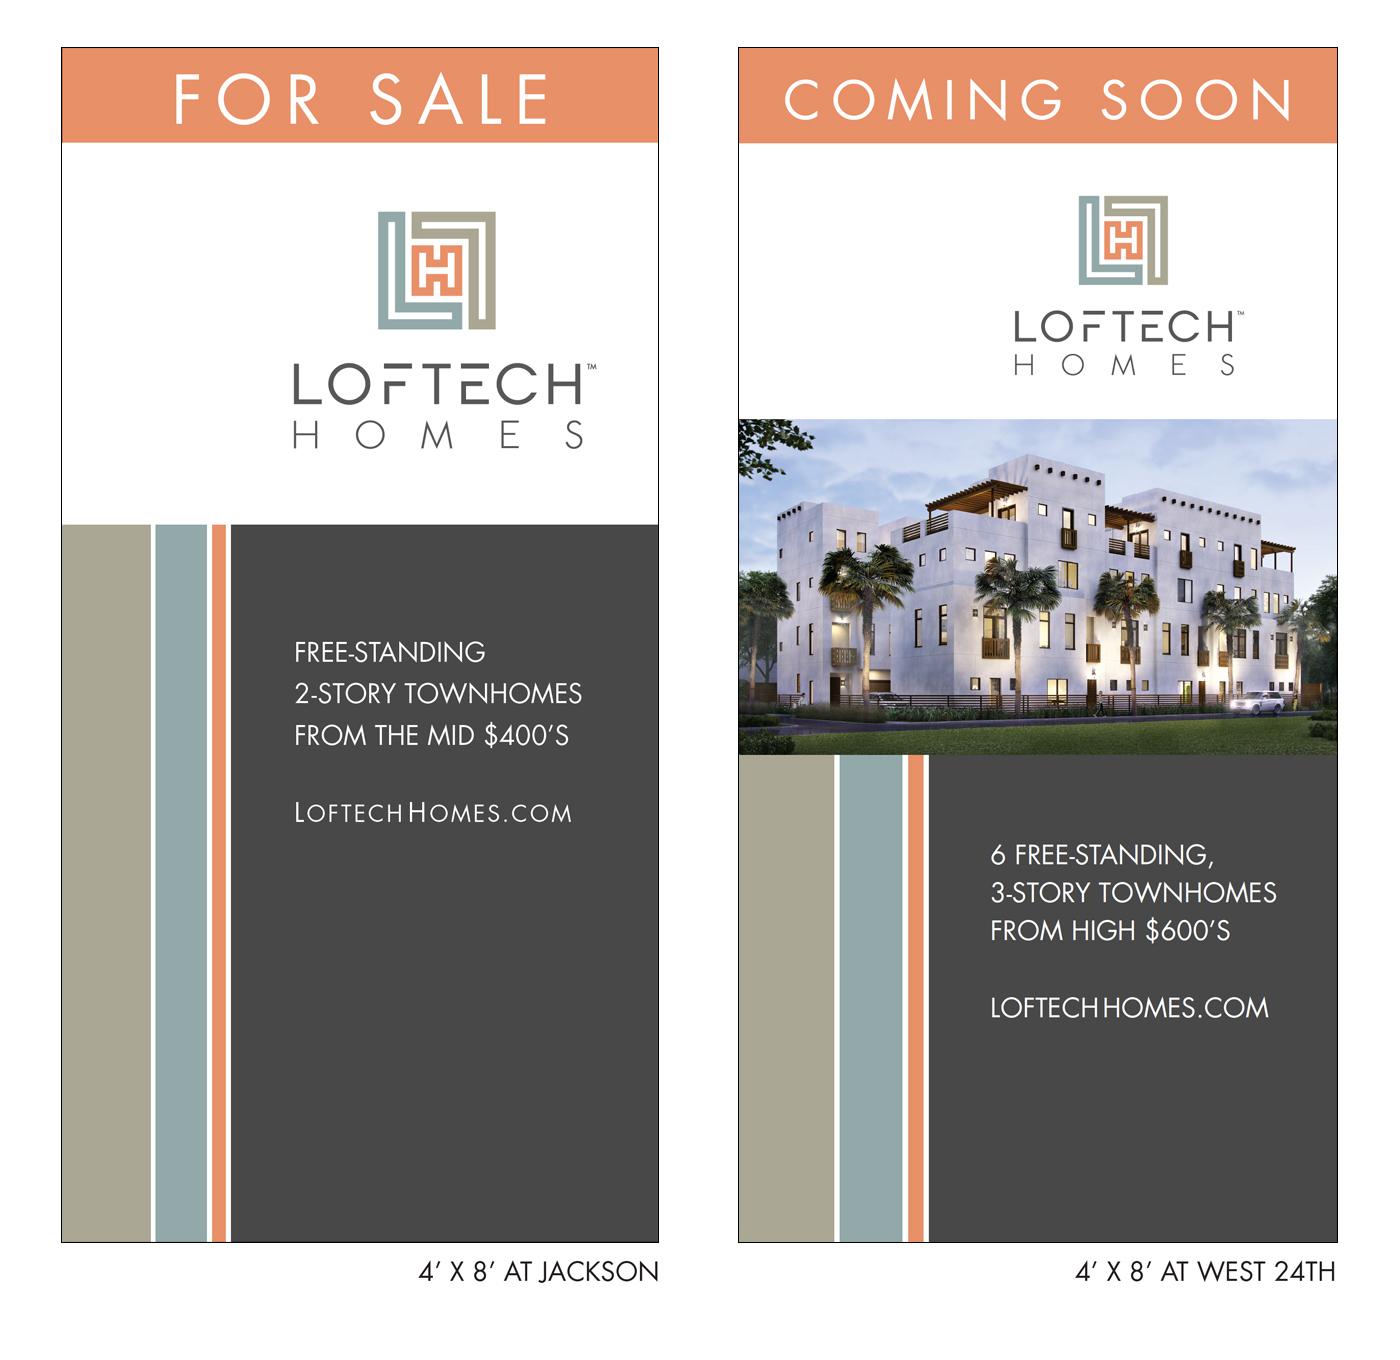 Loftech_SiteSigns-1b.jpg